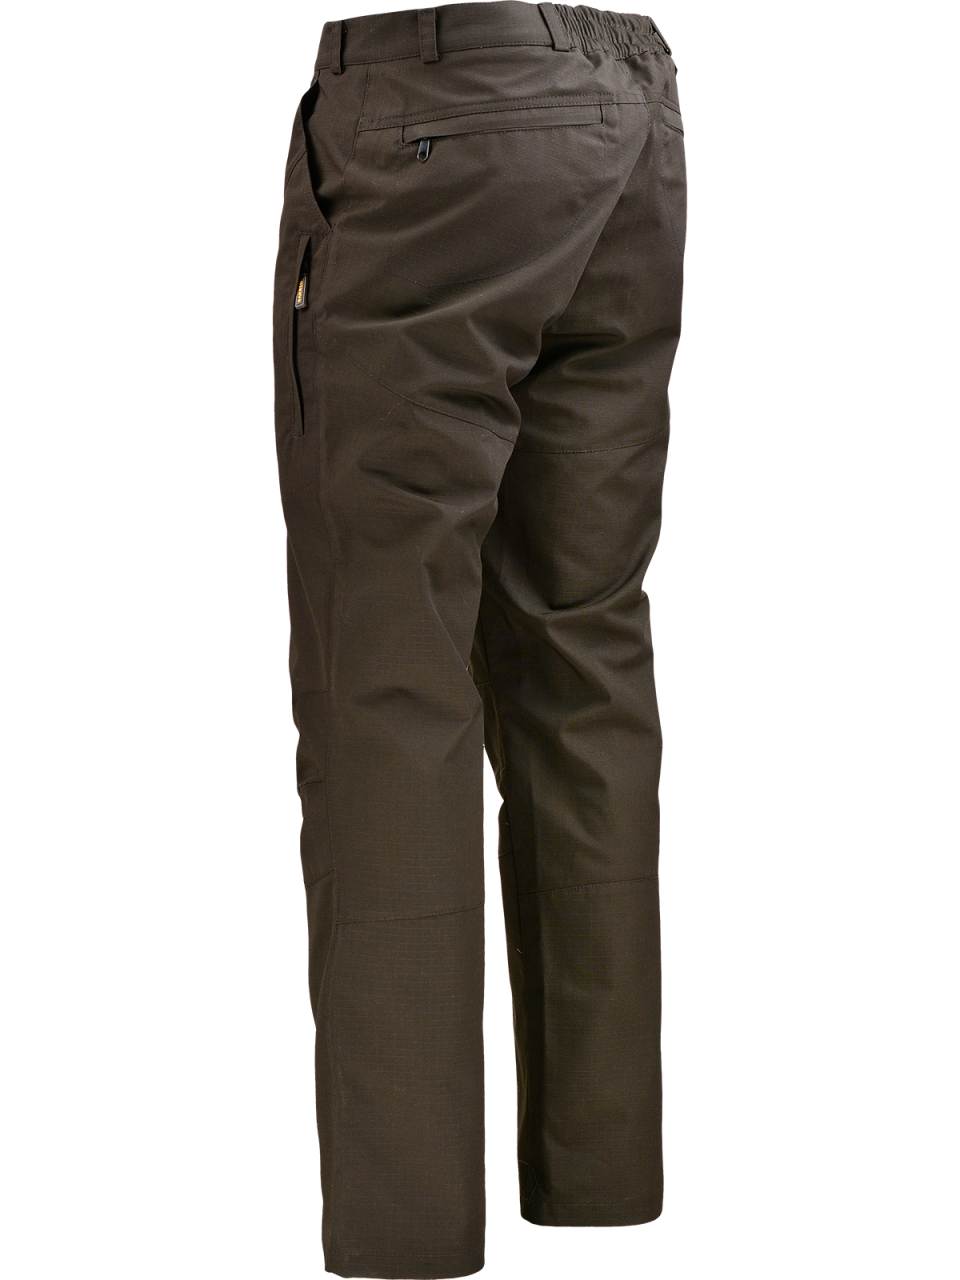 outdoorové nohavice Toranel zad